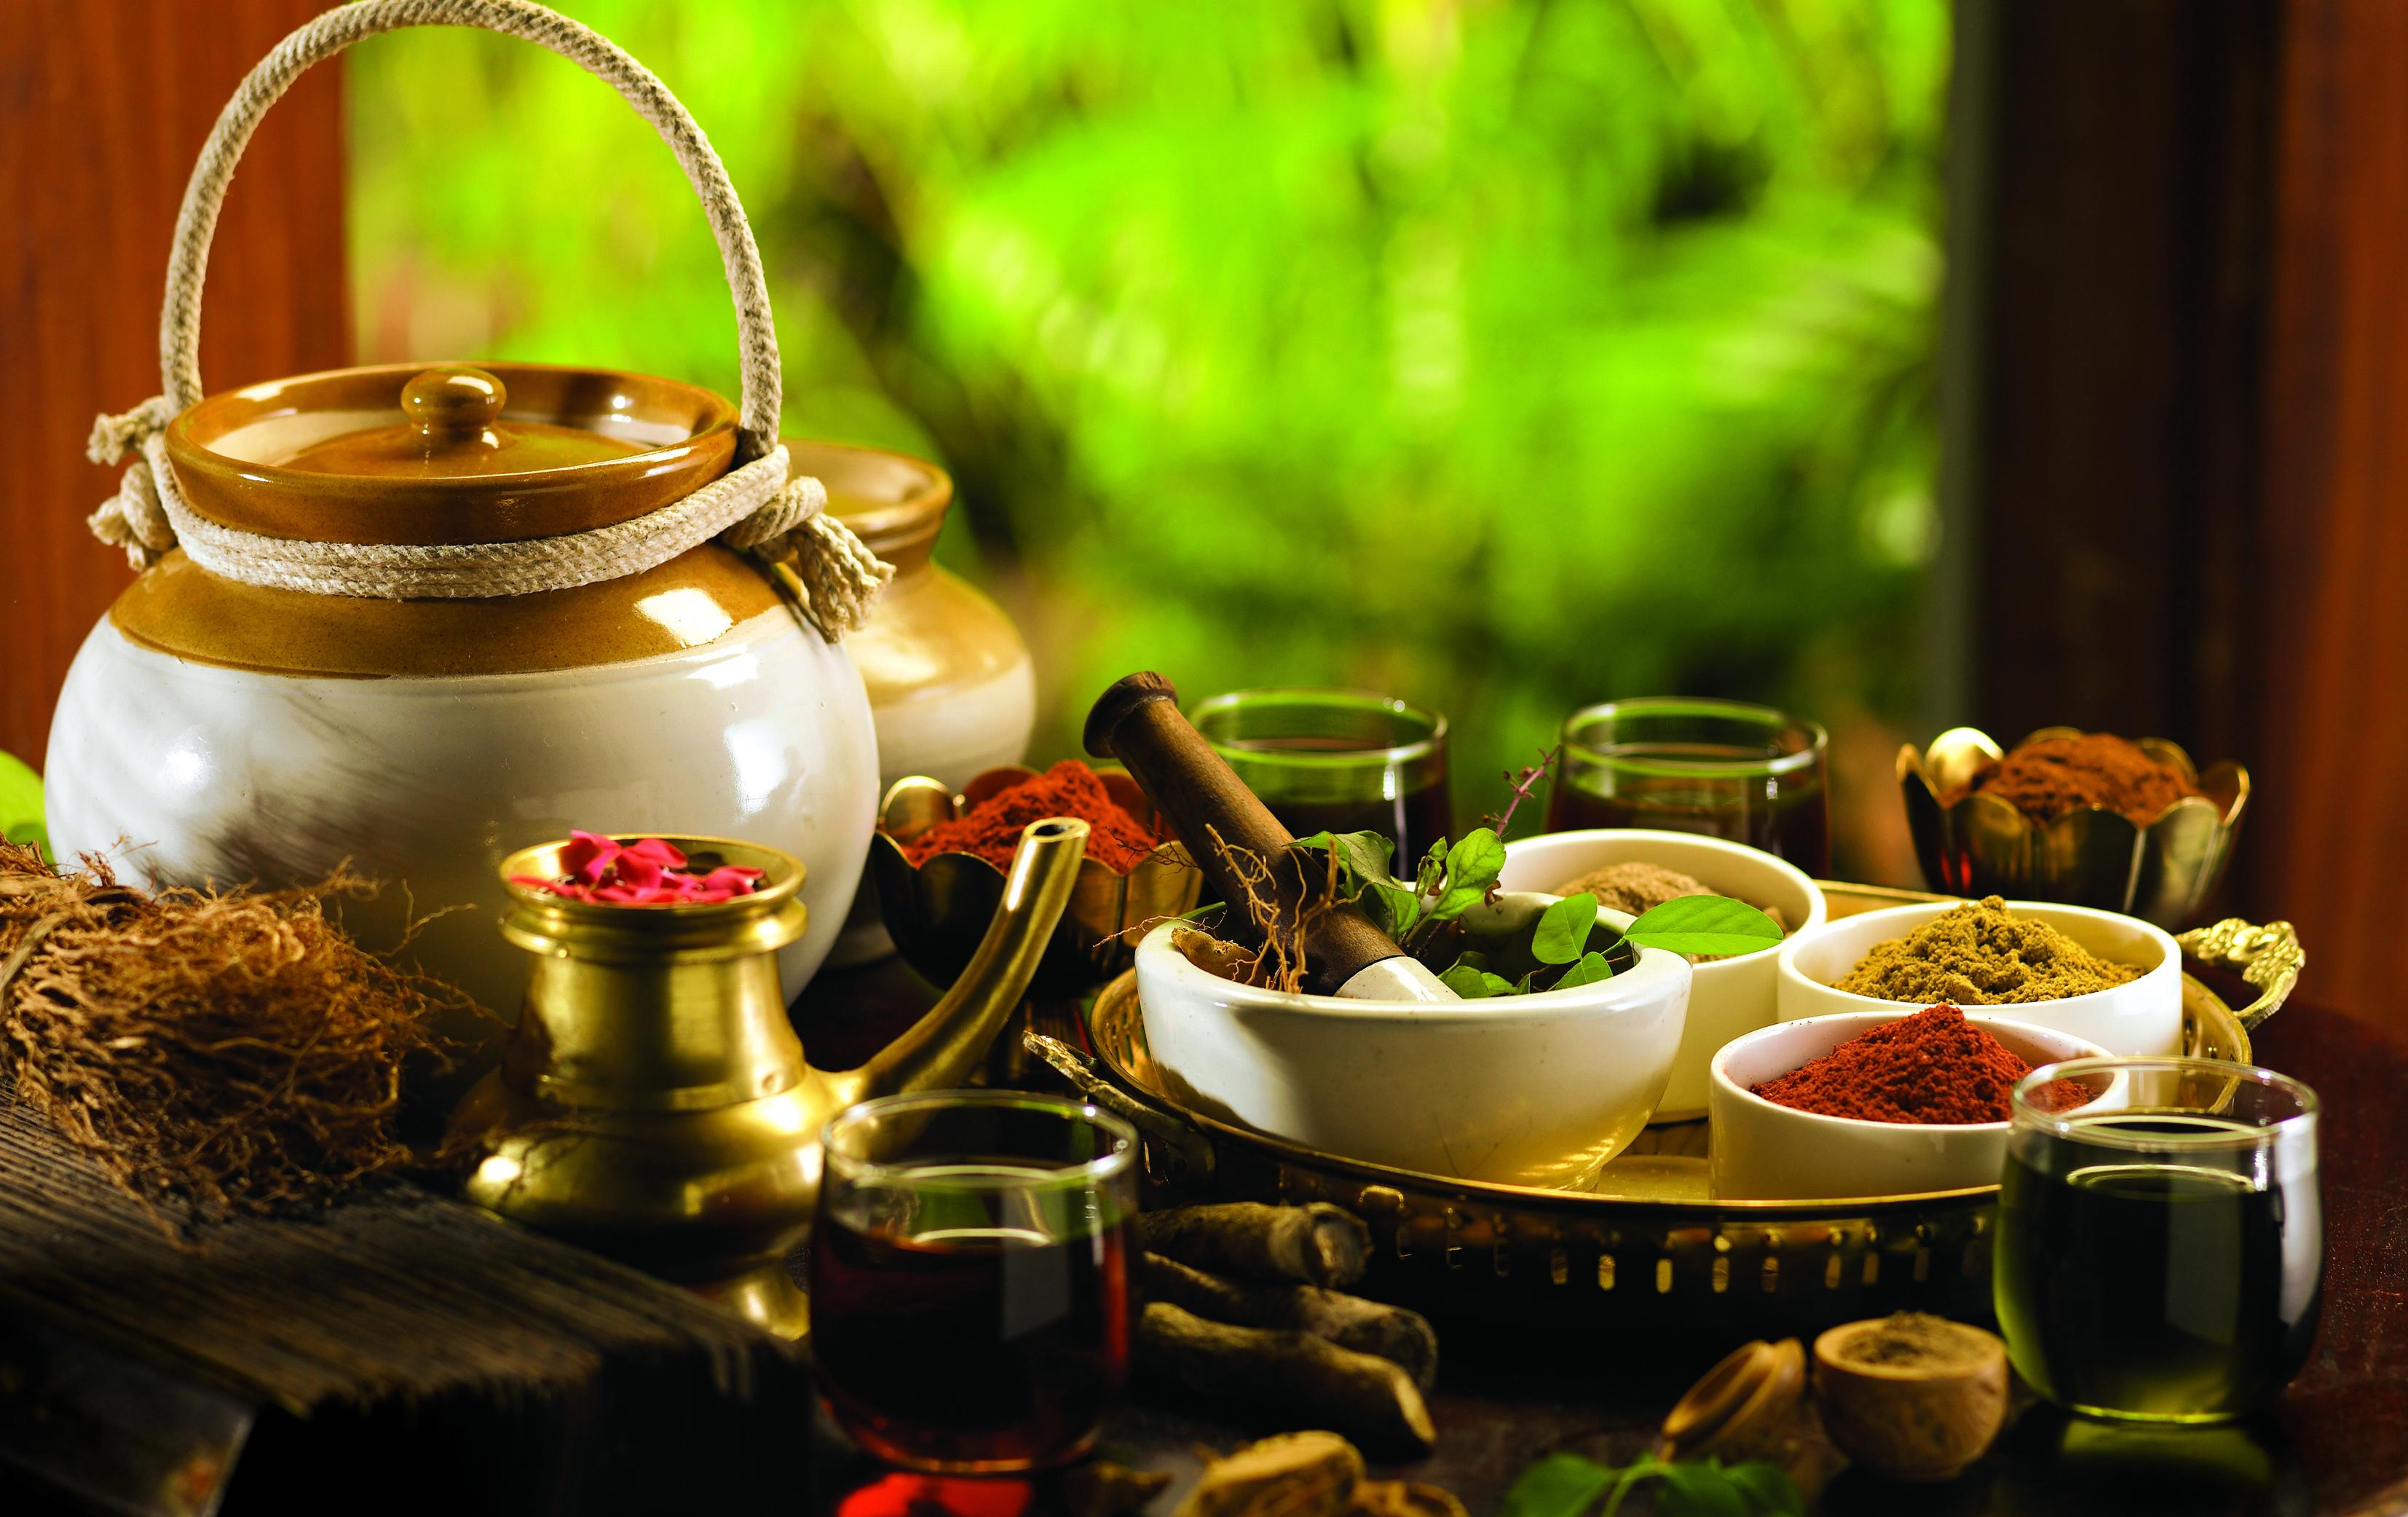 Keralatourism.org